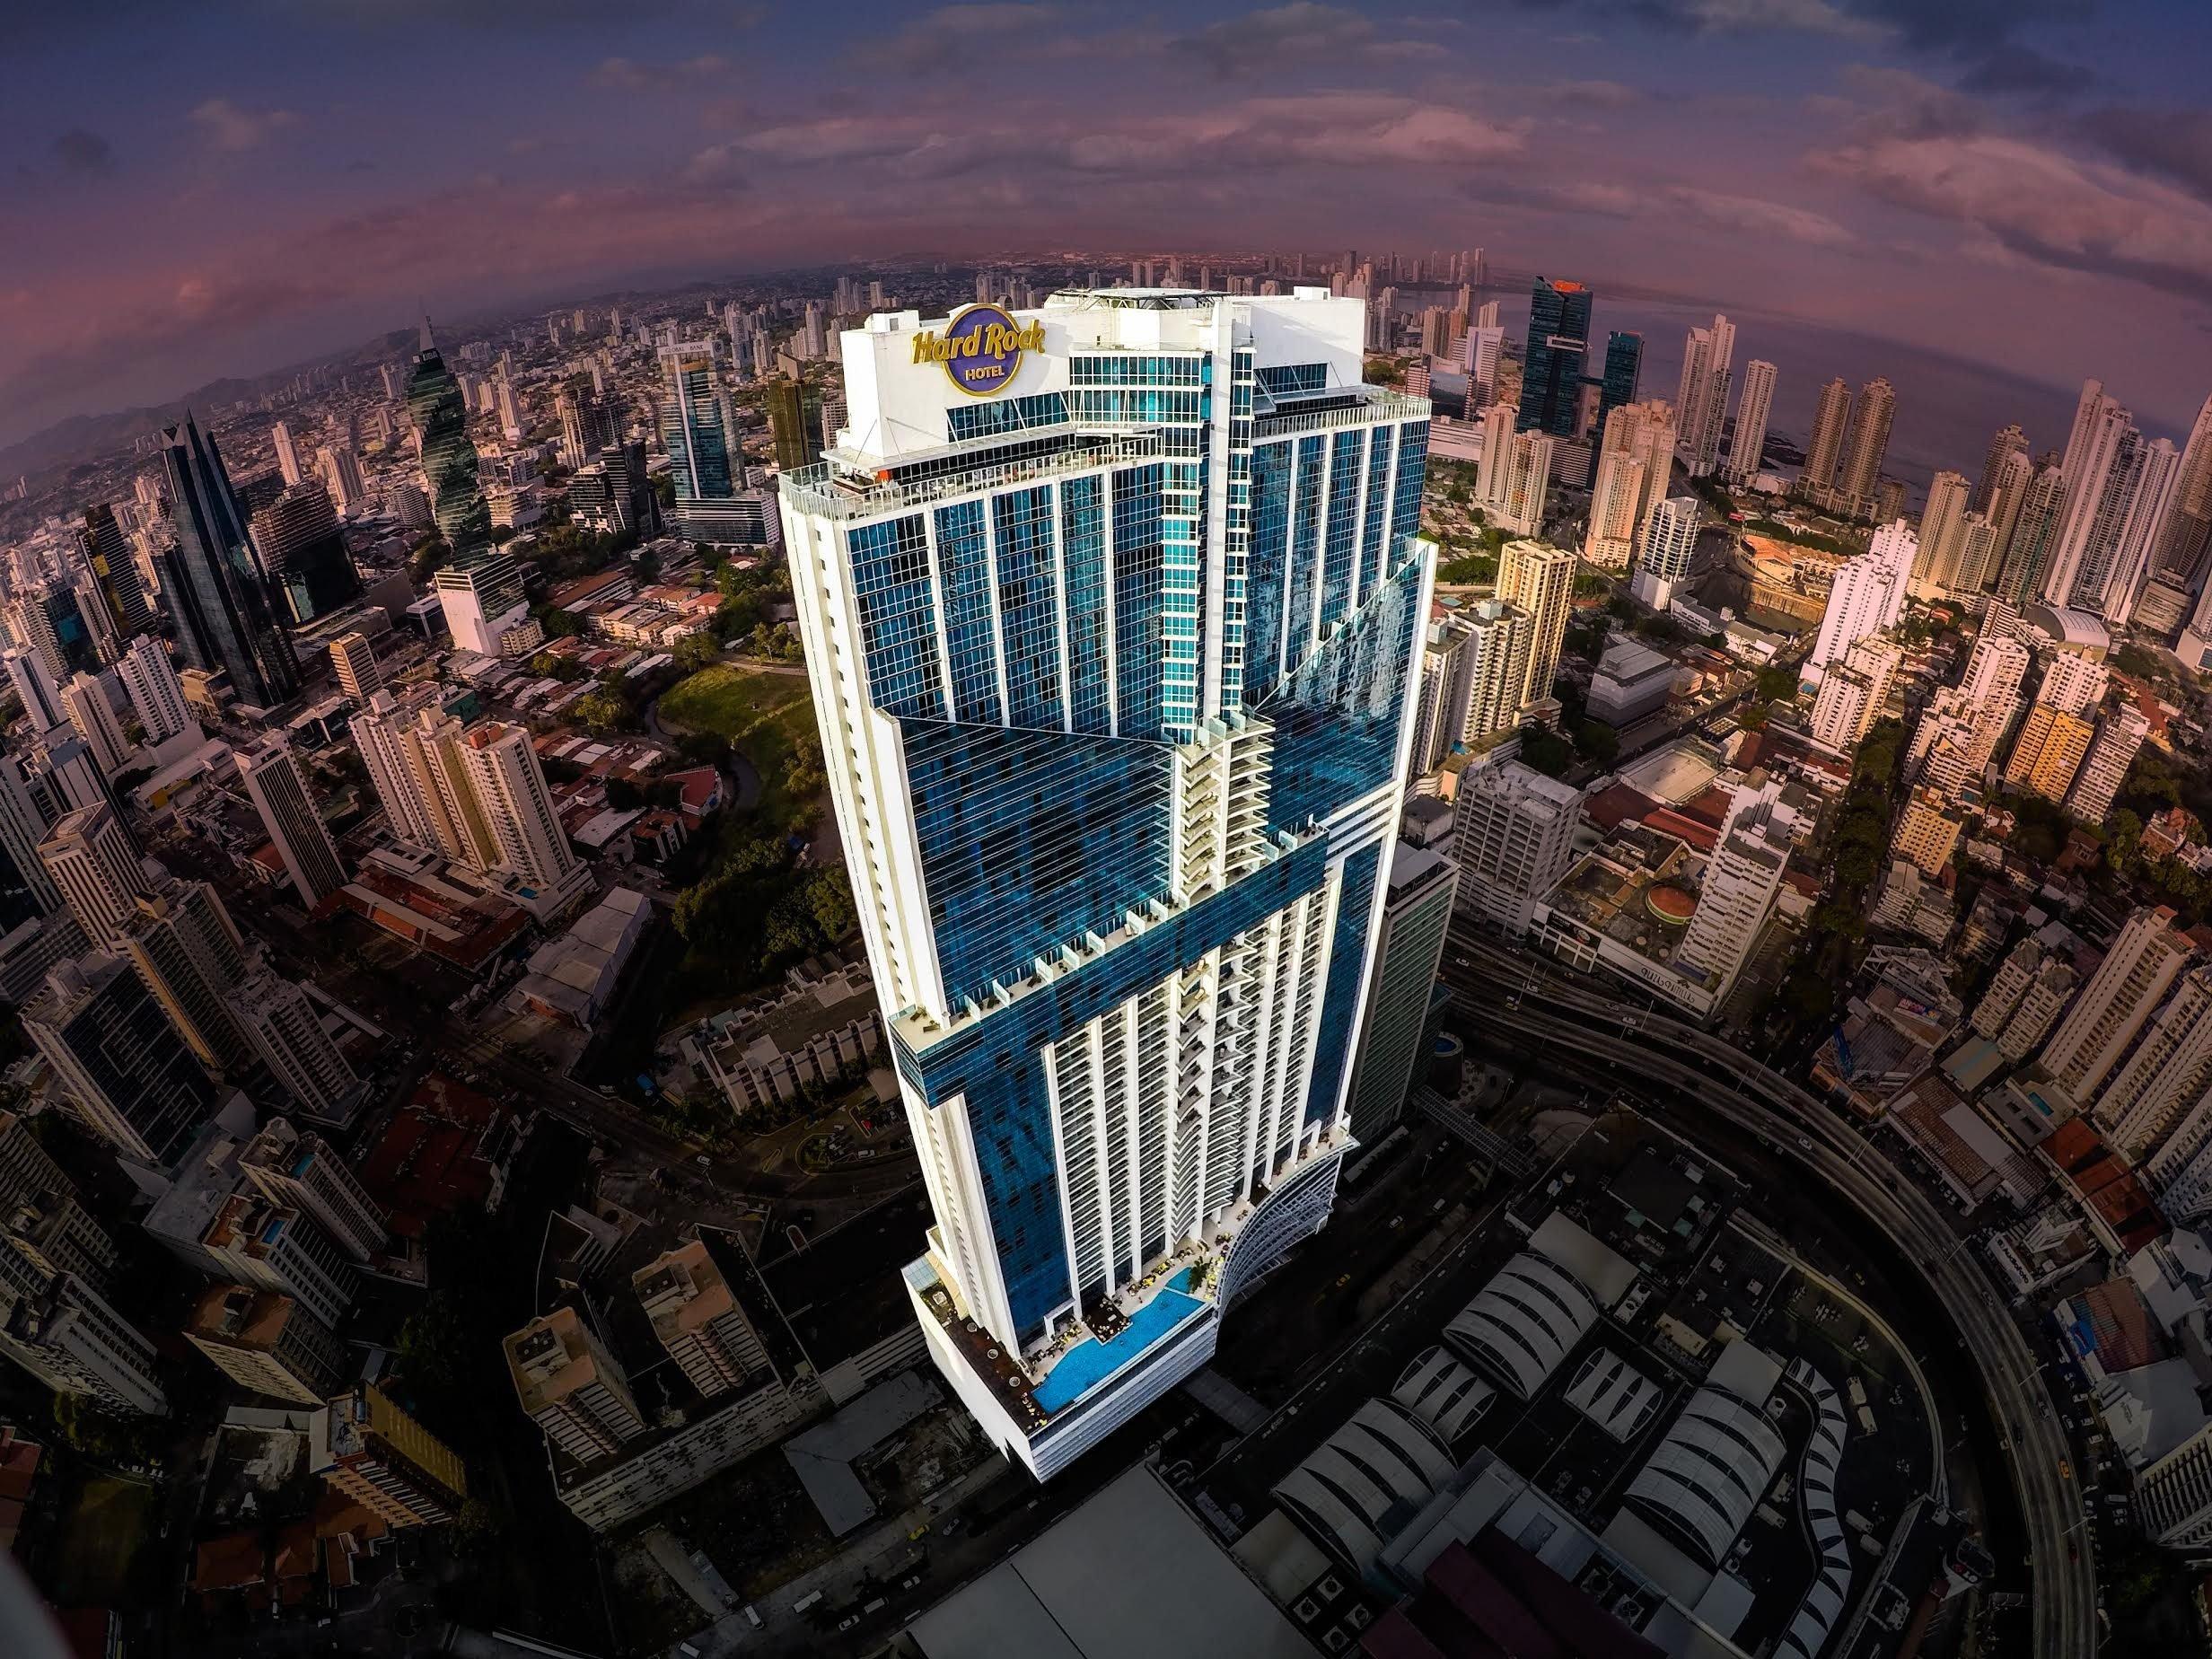 Panama's towering Hard Rock Hotel